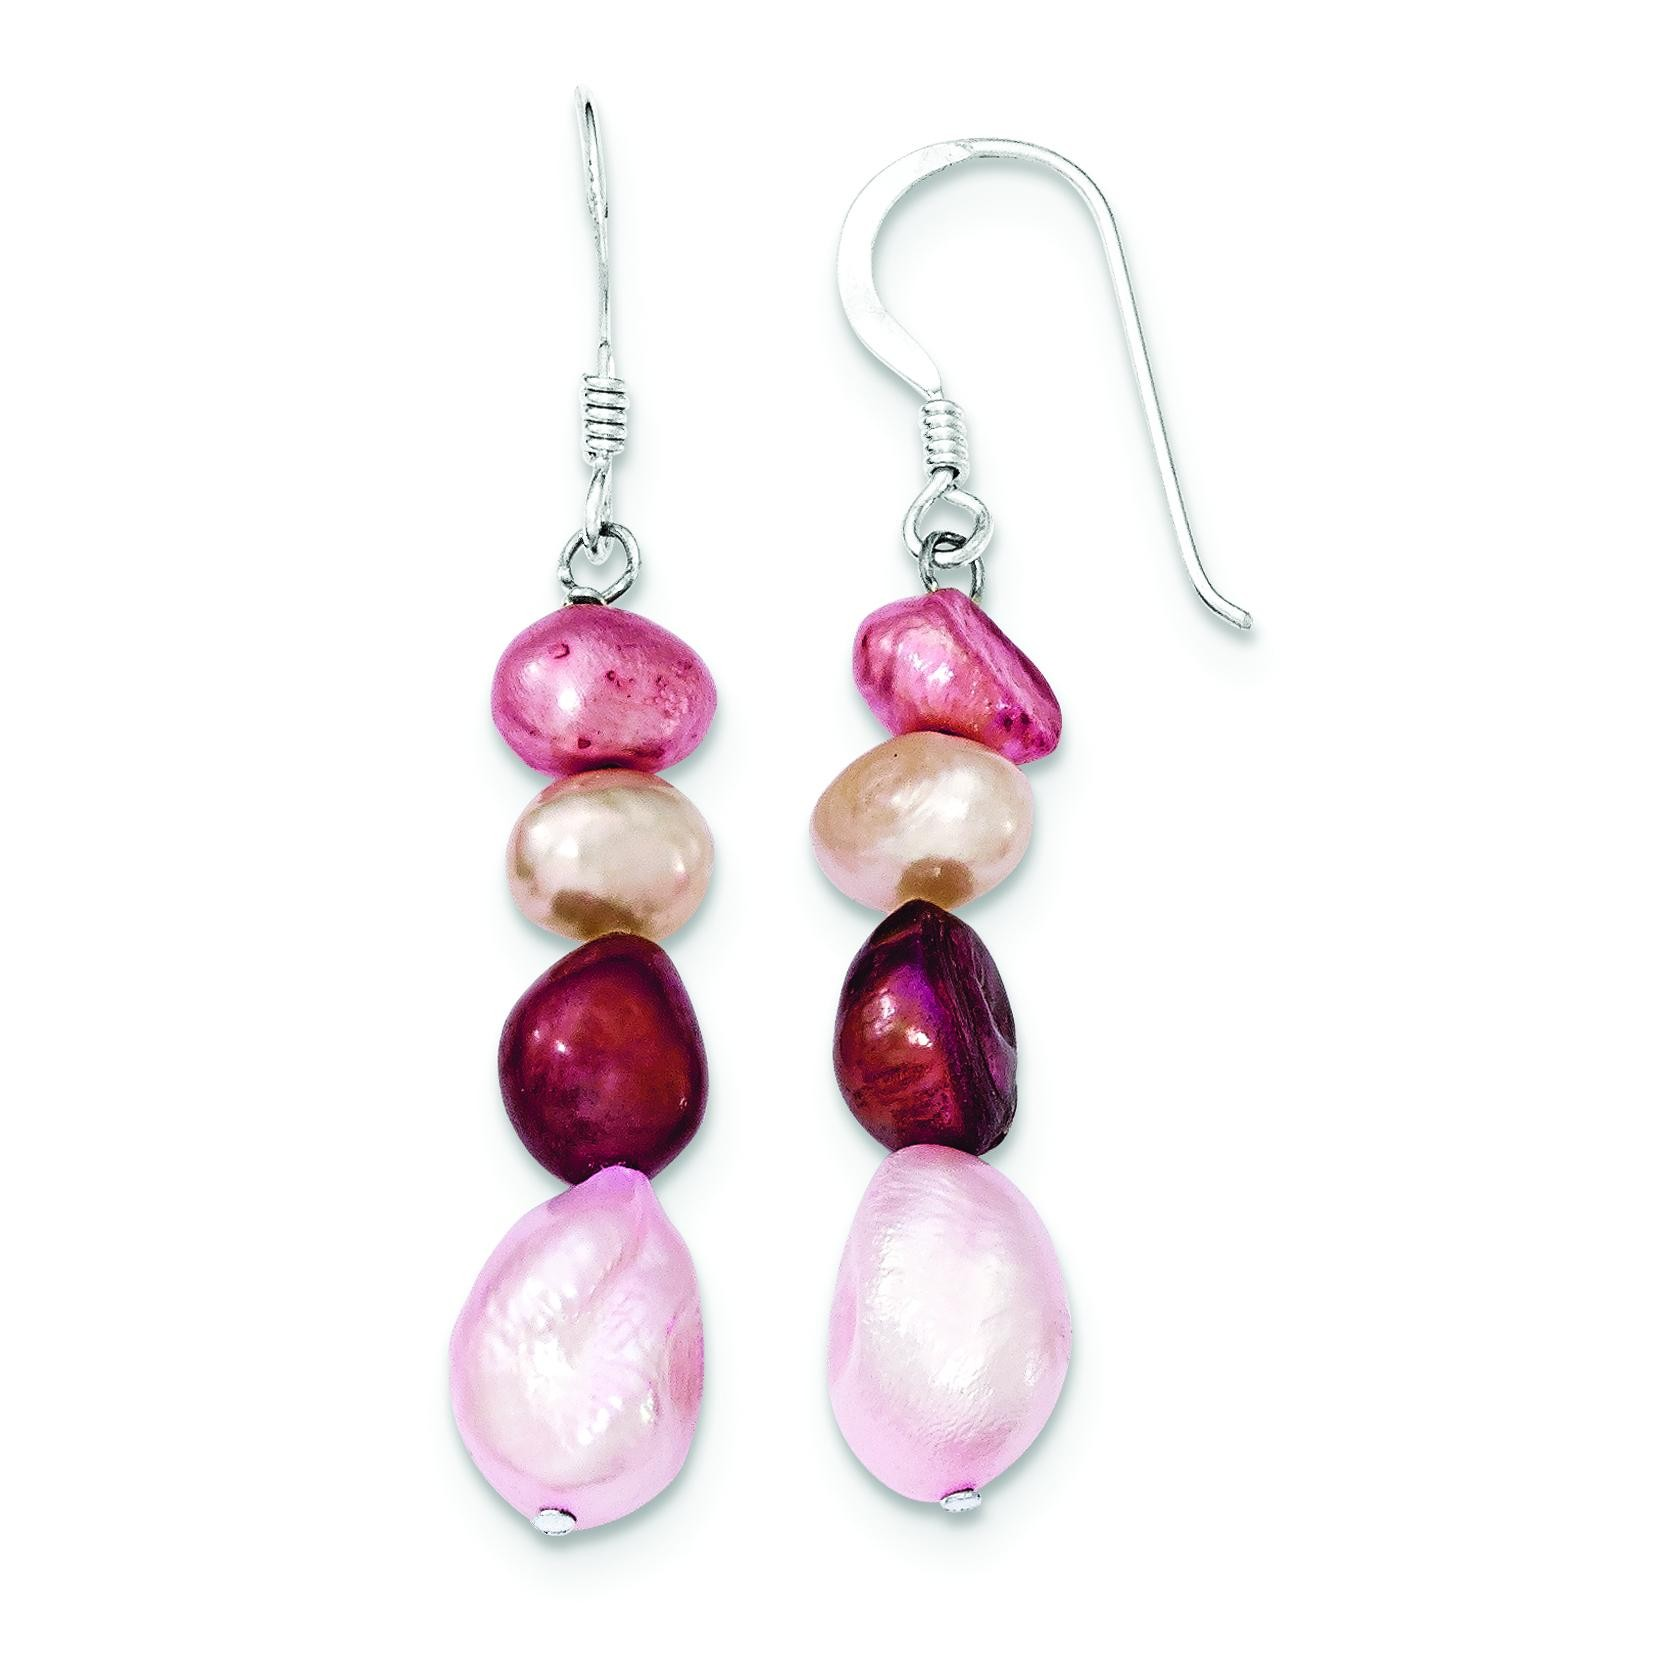 Freshwater Cultured Pearl Multicolor Earrings in Sterling Silver